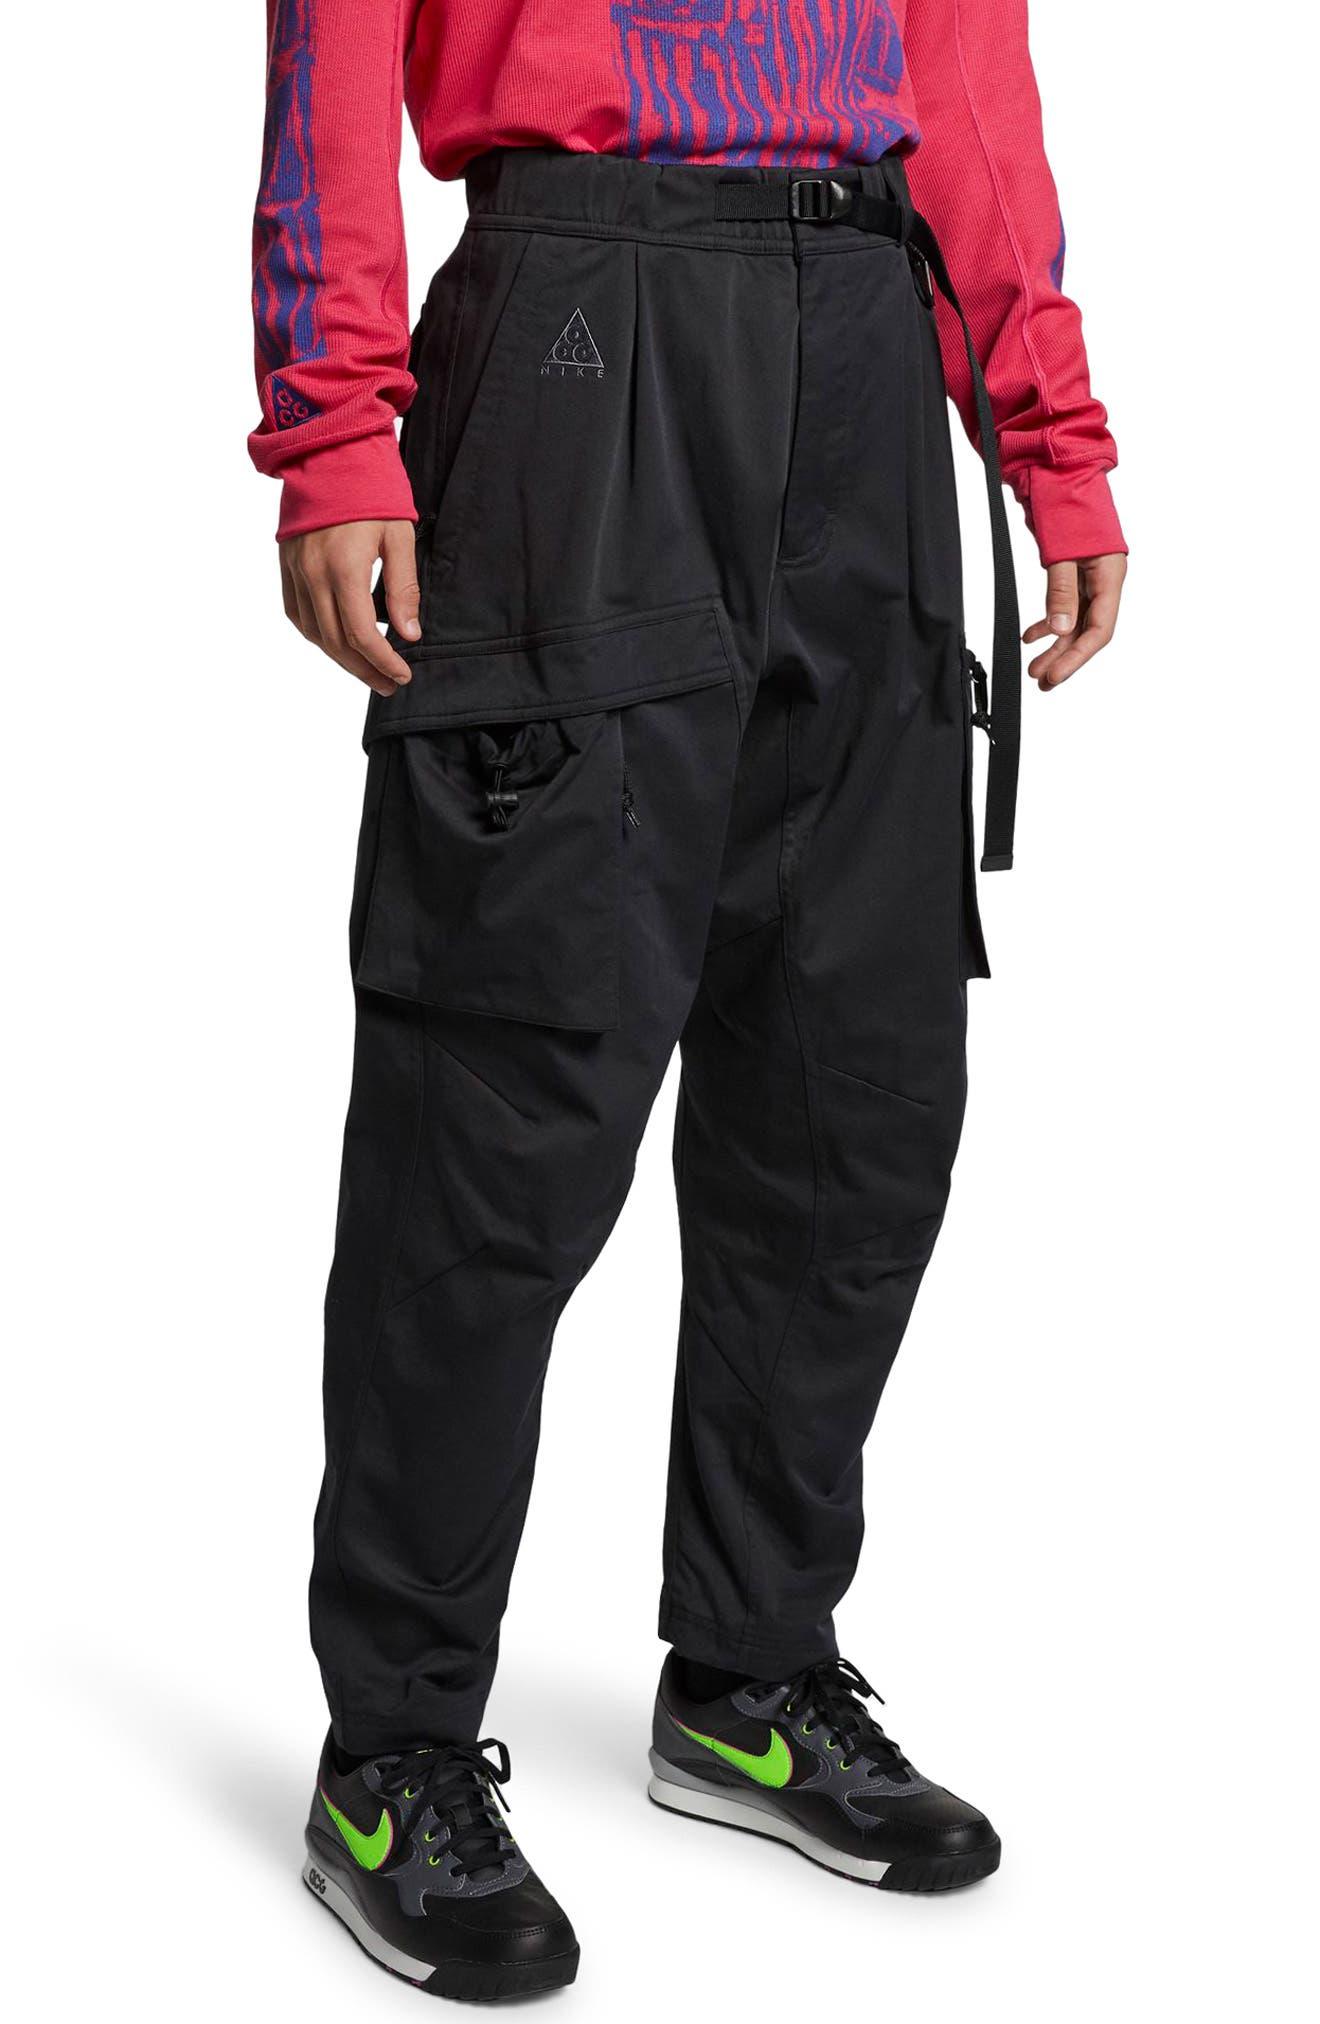 Nike Acg Cargo Pants, Black